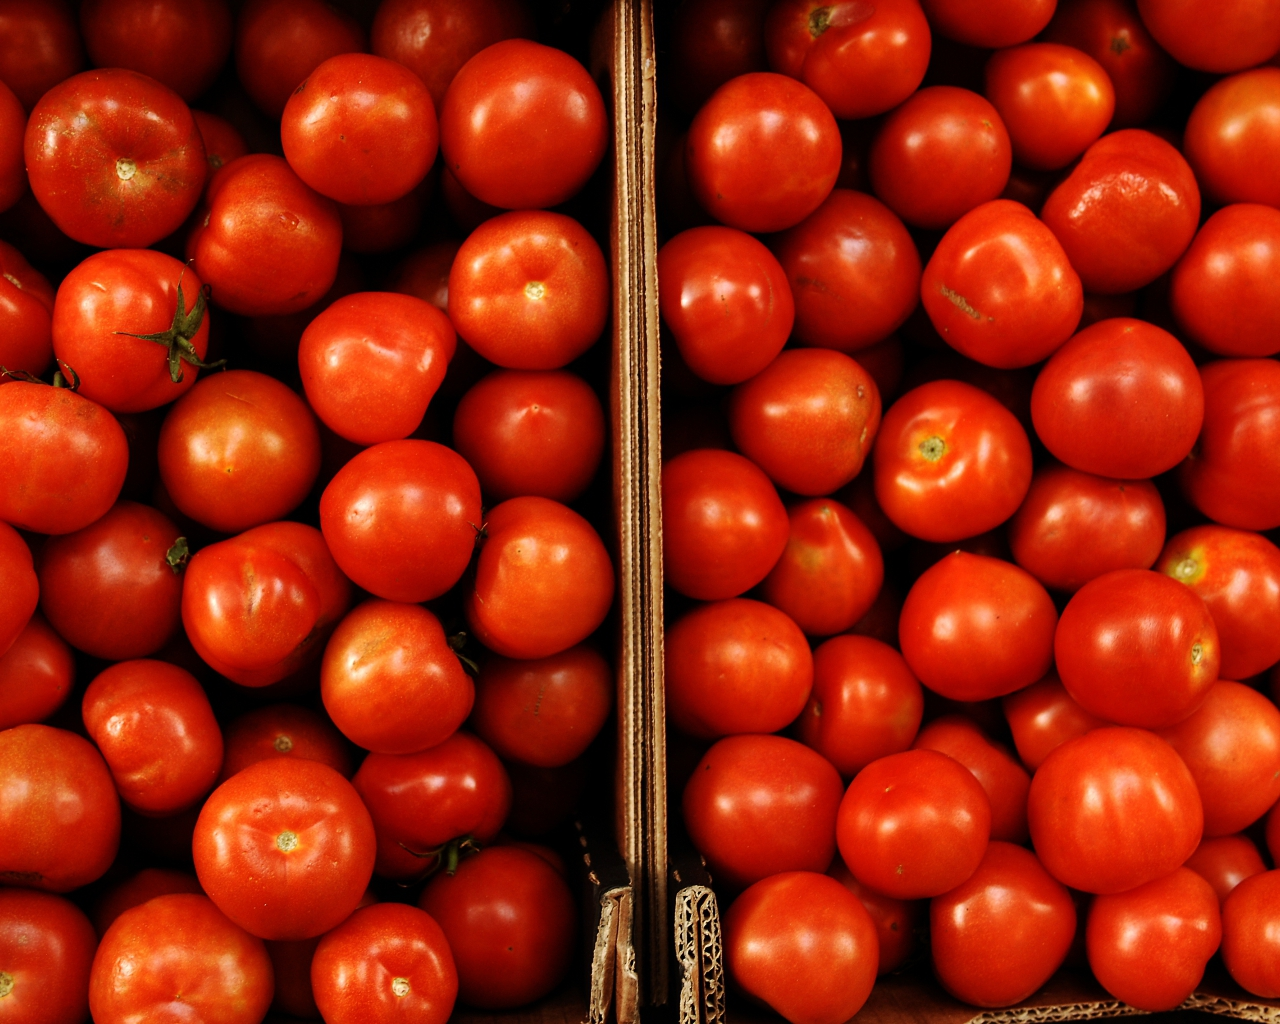 Insospechados beneficios por comer tomates - ElSol.com.ar - Diario ...